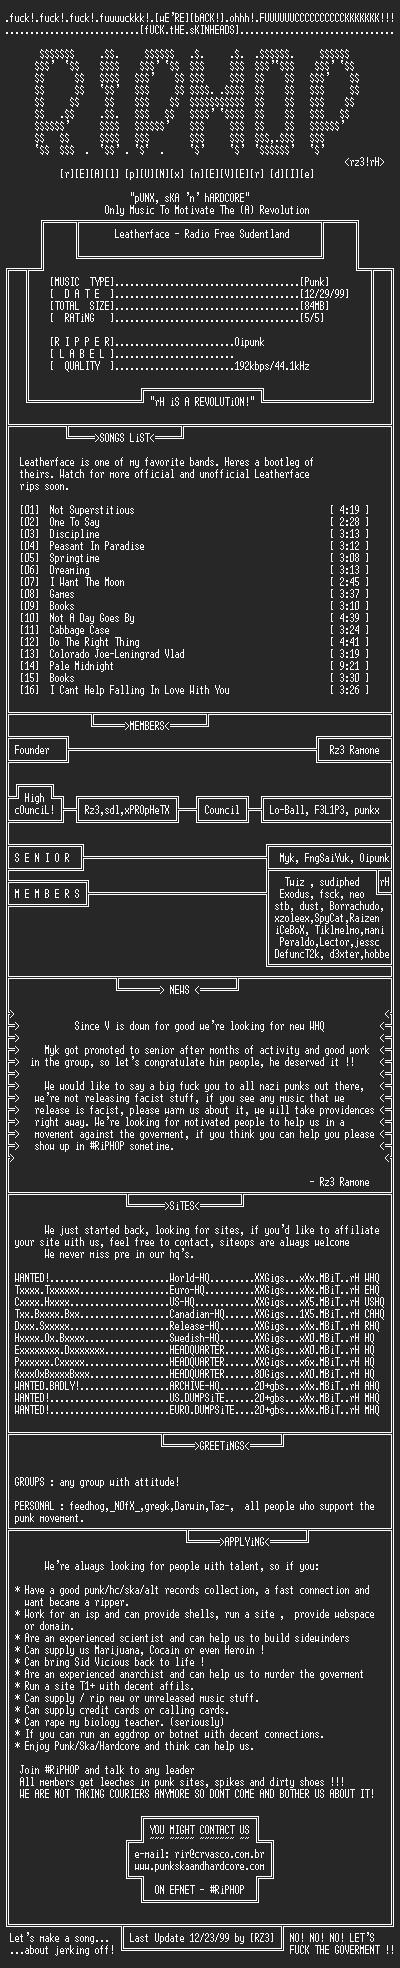 NFO file for Leatherface-Radio_Free_Sudentland-199x-rH